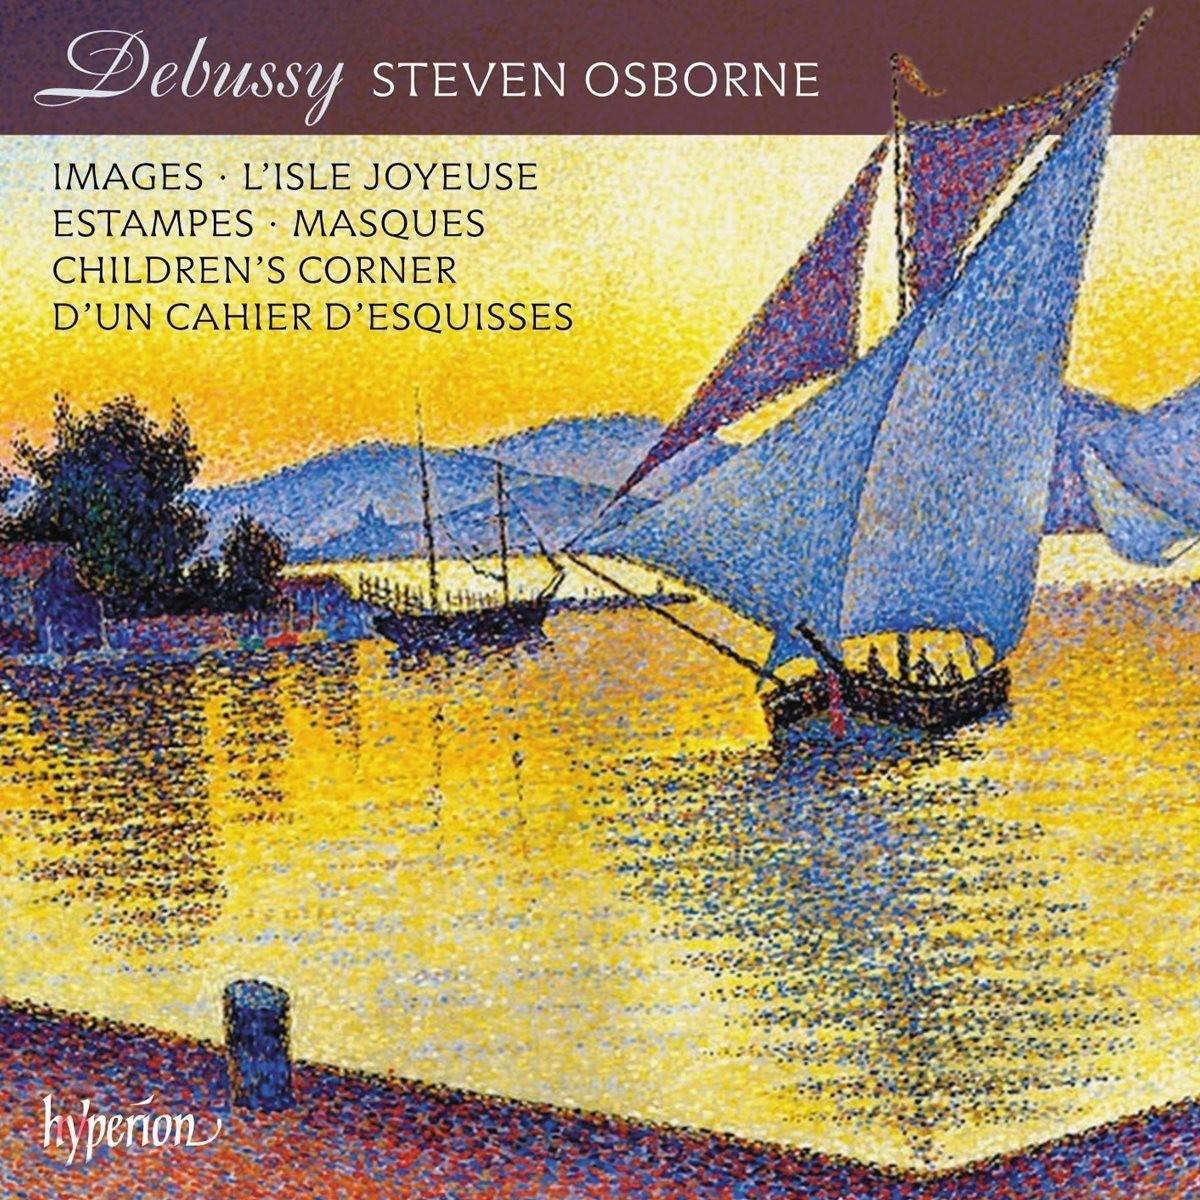 Steven Osborne 드뷔시: 영상, 판화, 어린이 세계, 마스크 - 스티븐 오스본 (Debussy: Images, Estampes, Children's Corner, Masques, L'Isle Joyeuse)